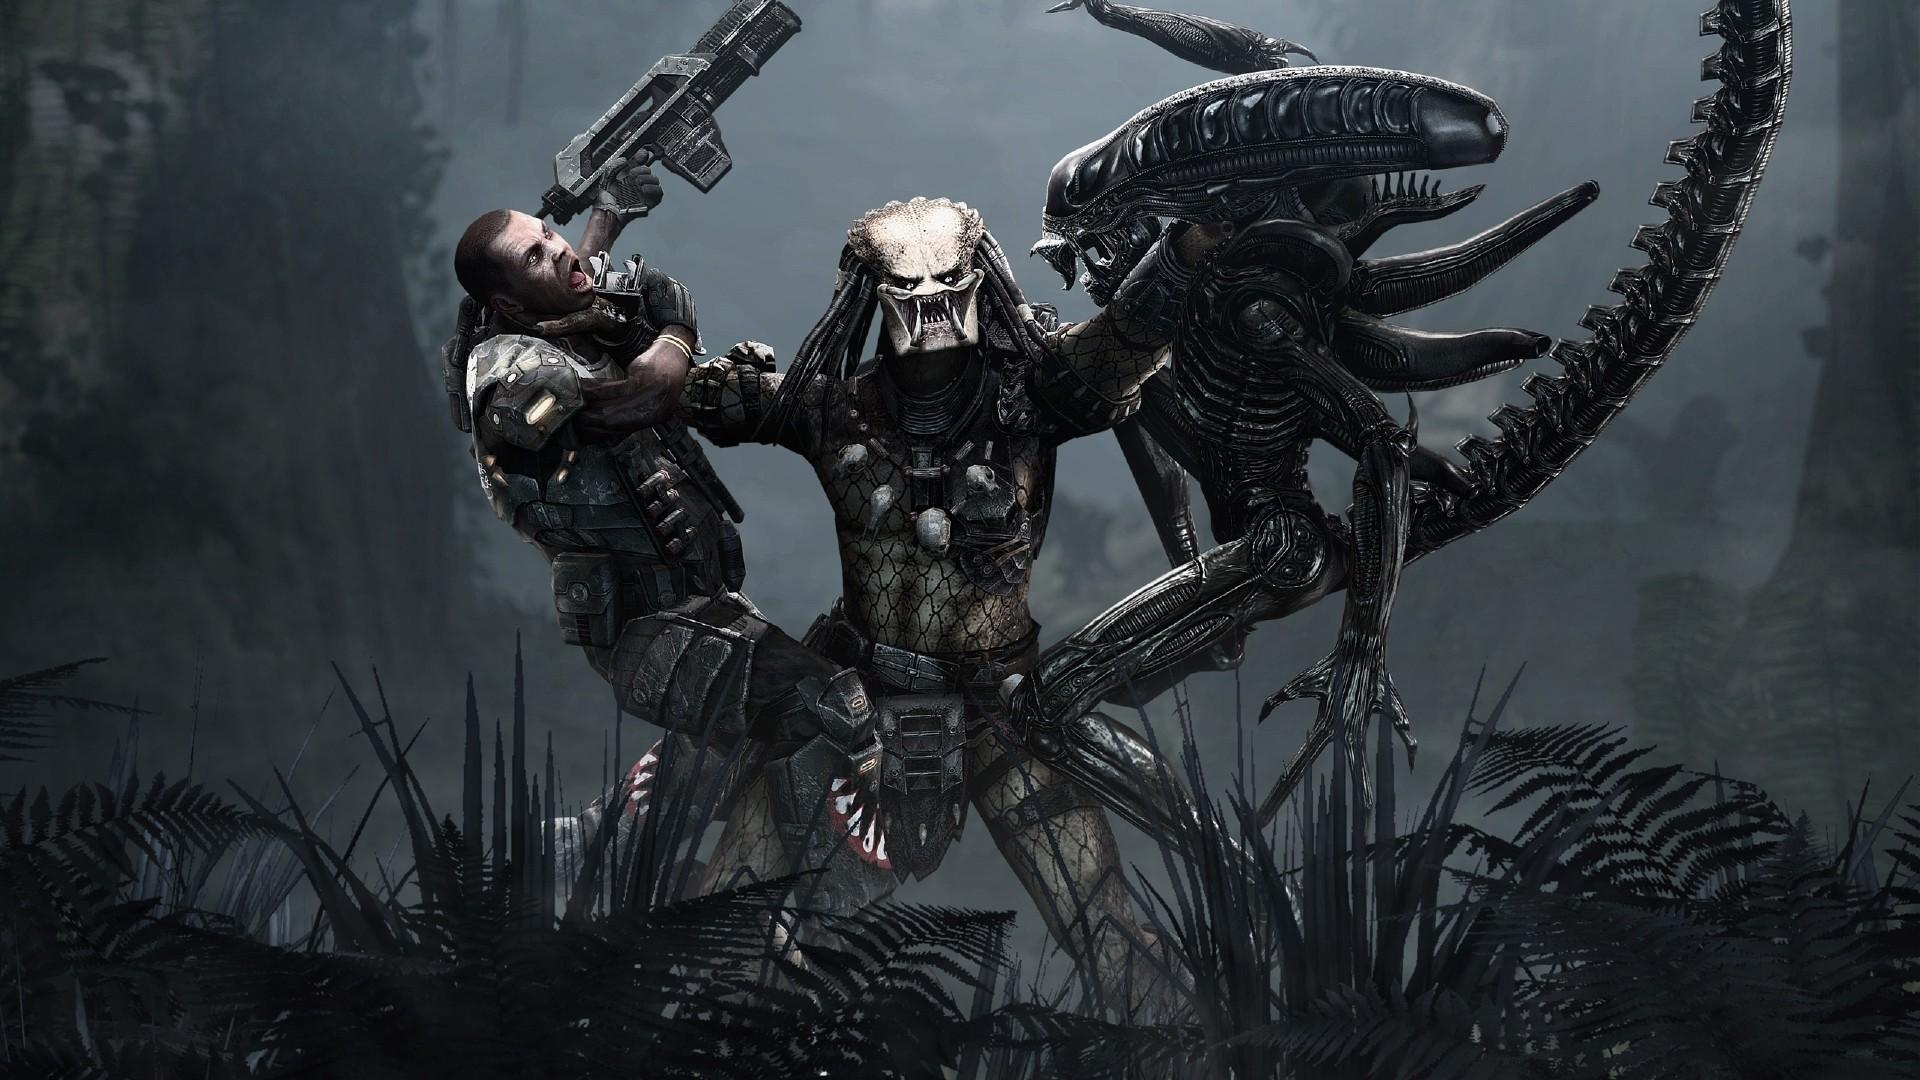 0 Download Alien Wallpaper Wallpoper #449786 Full HD Wallpaper  alien vs predator scramble monster jungle rifle .